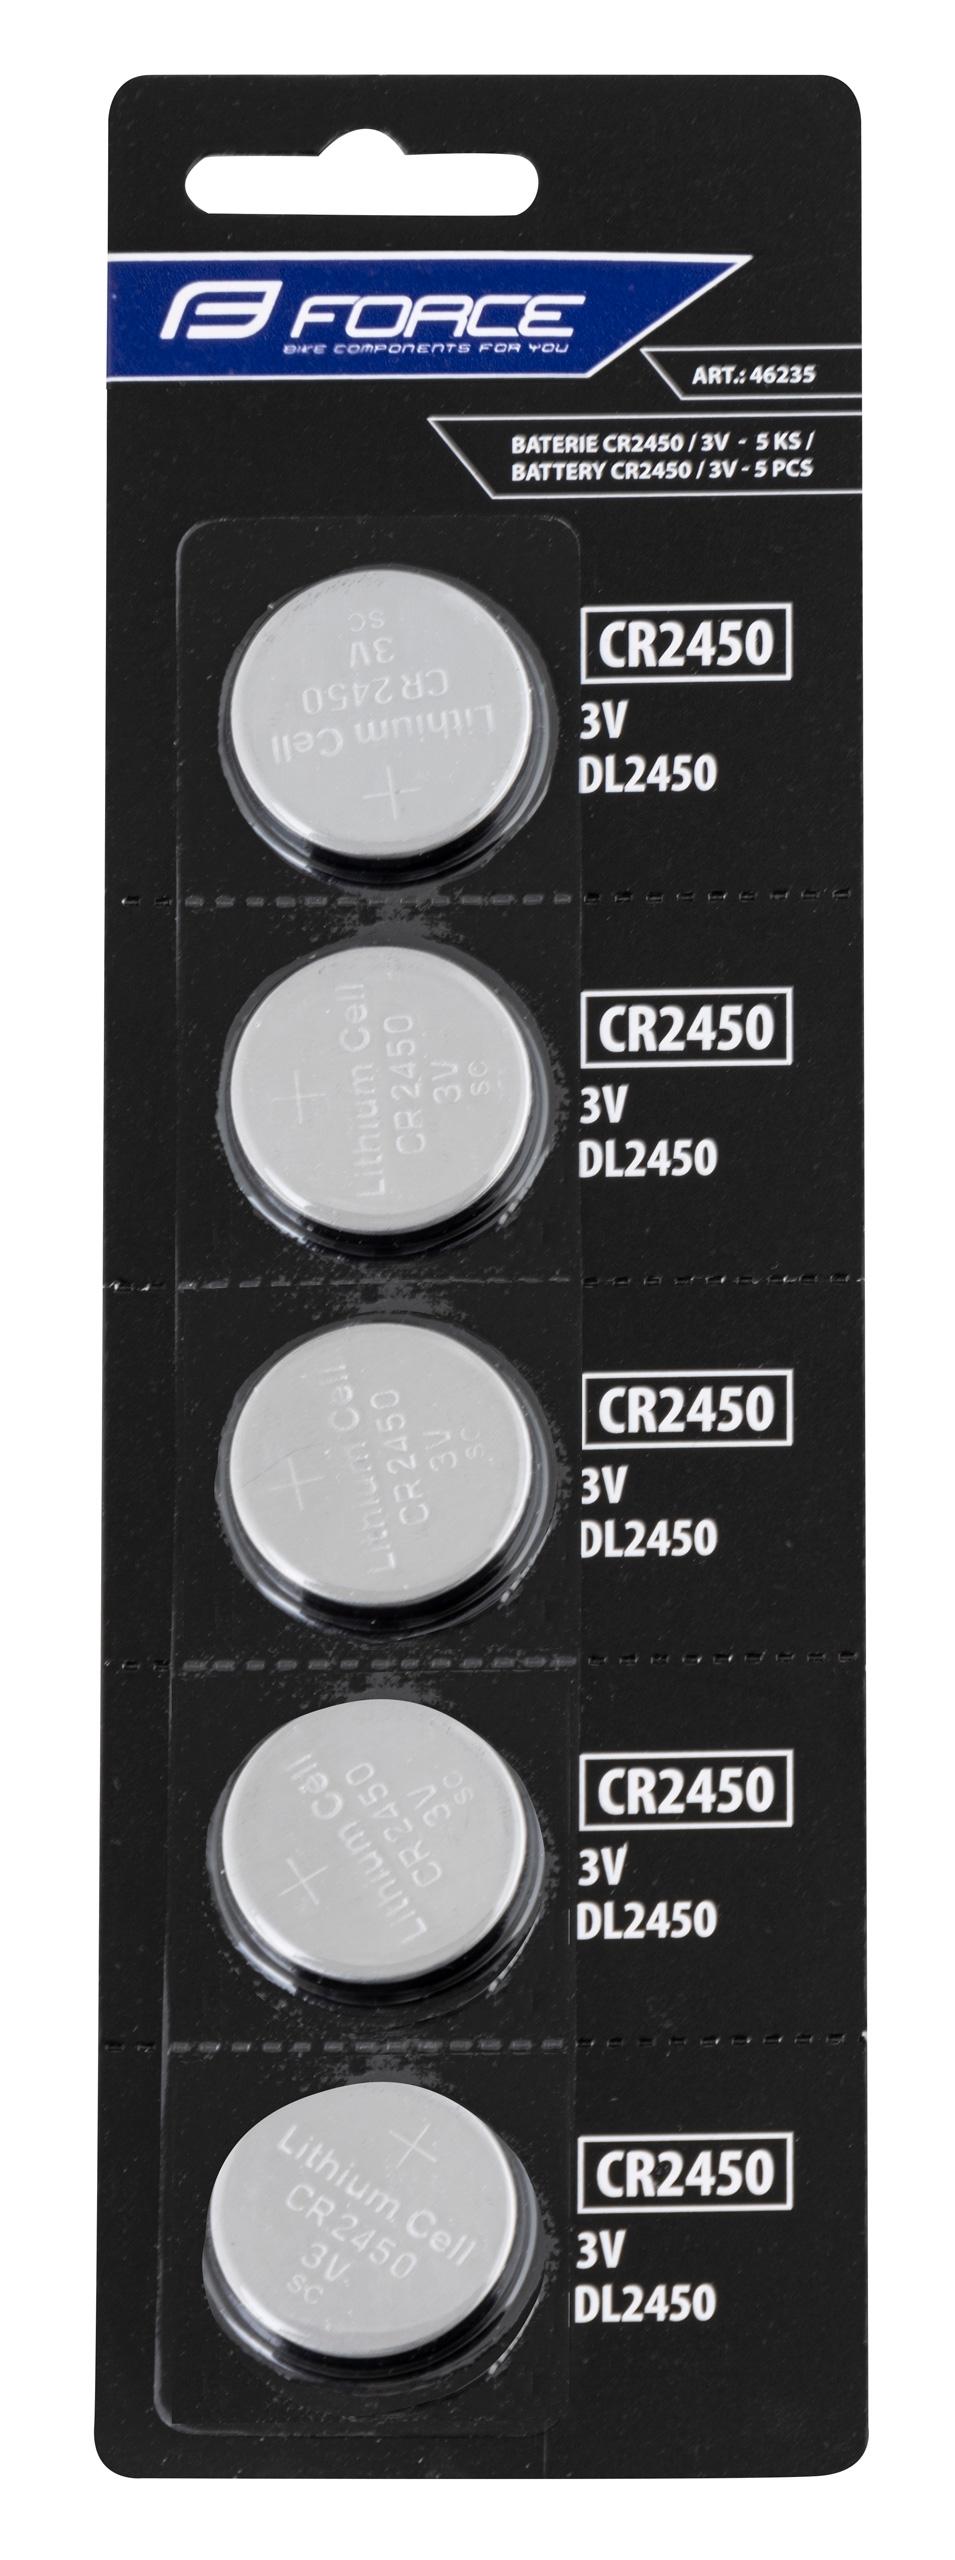 baterie FORCE mincové CR2450 / 3V 1 x 5 ks